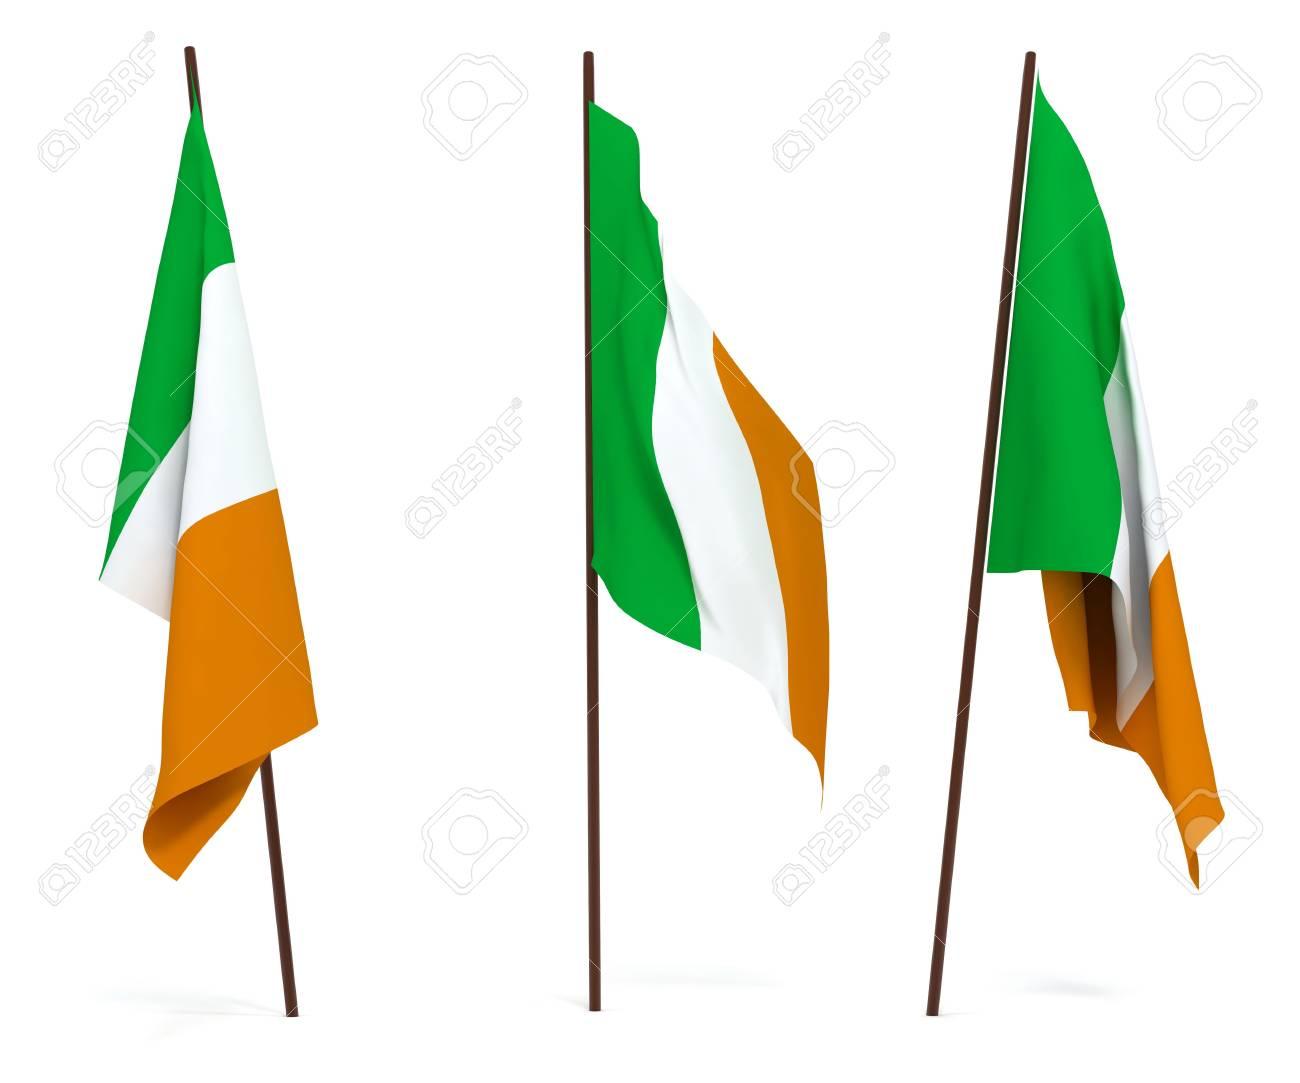 The state flag of Ireland. On white background Stock Photo - 6532794